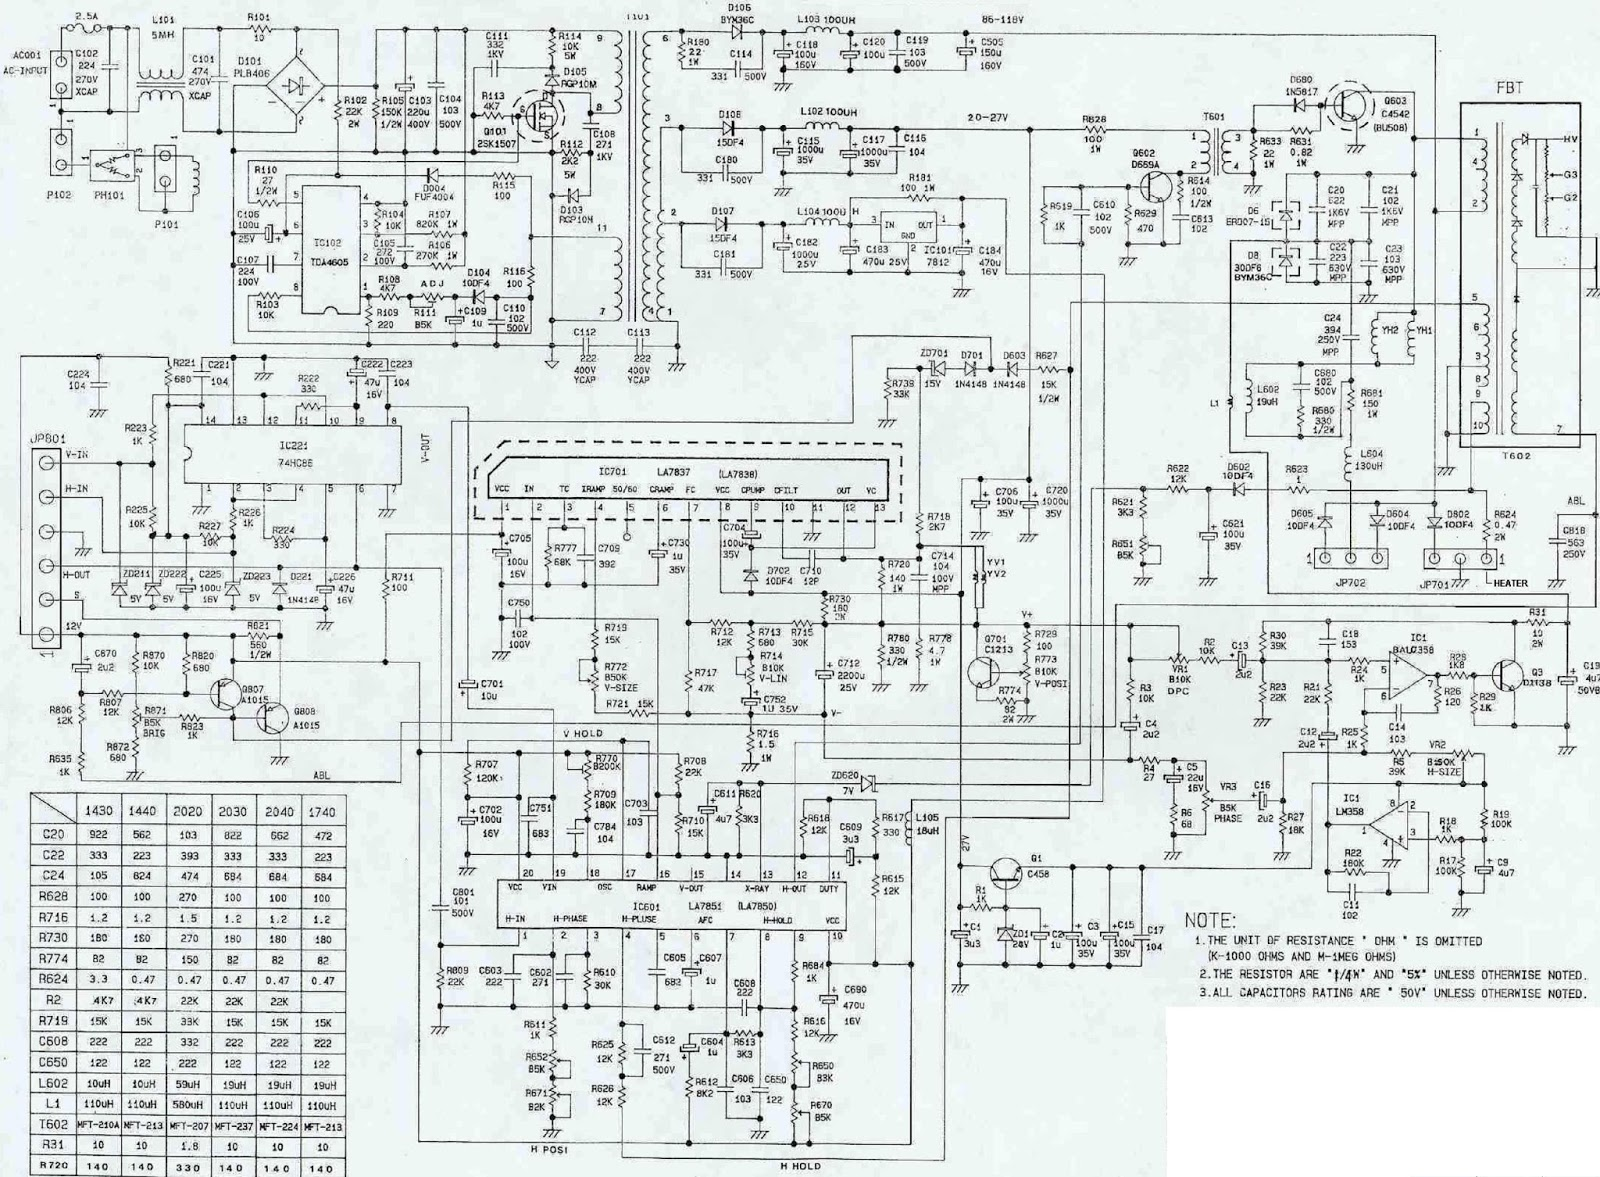 ps3 wiring diagram 14 7 fearless wonder de u2022 [ 1600 x 1177 Pixel ]